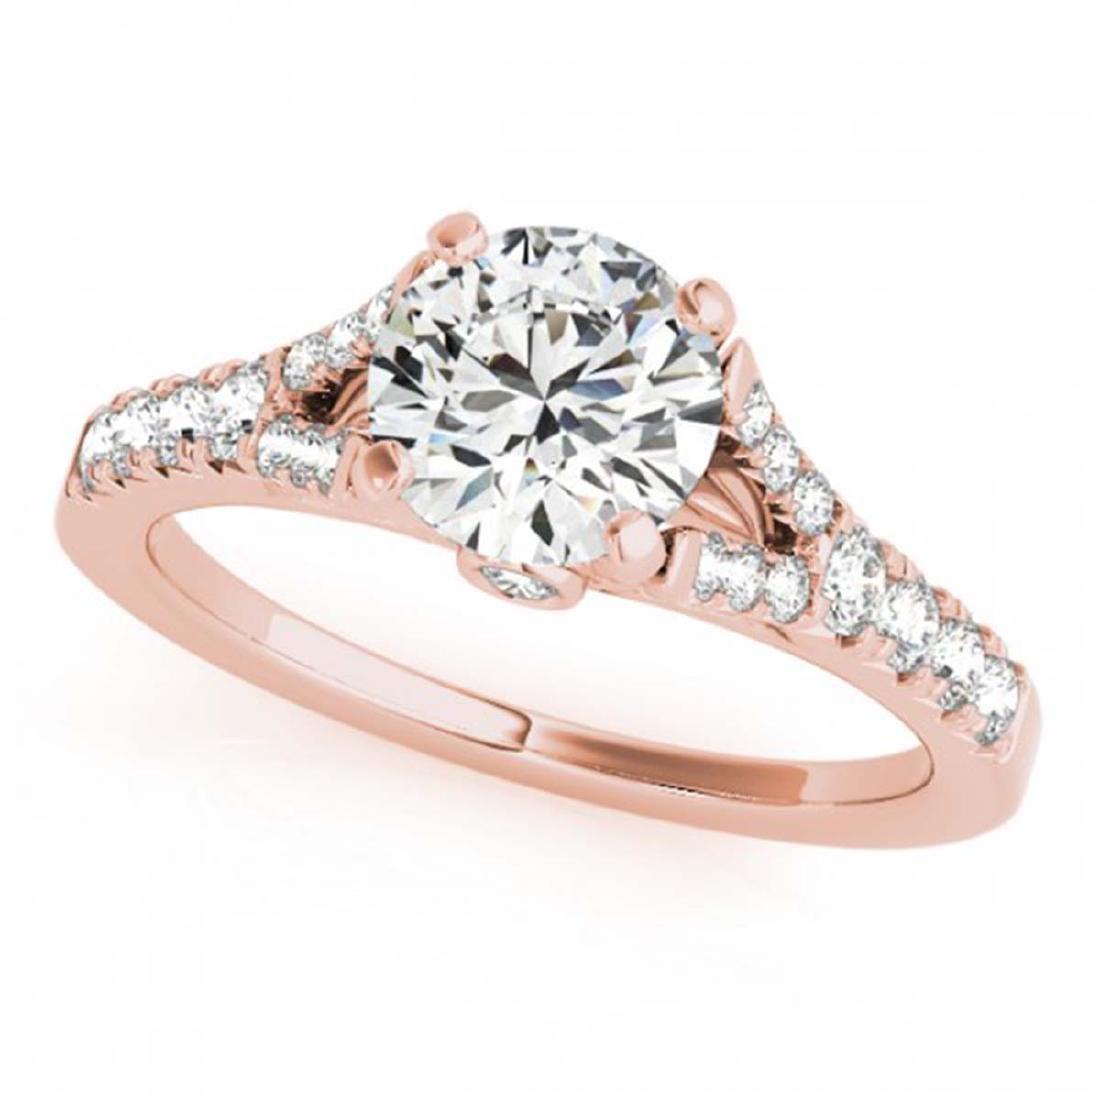 1.25 ctw VS/SI Diamond Solitaire Ring 14K Rose Gold -